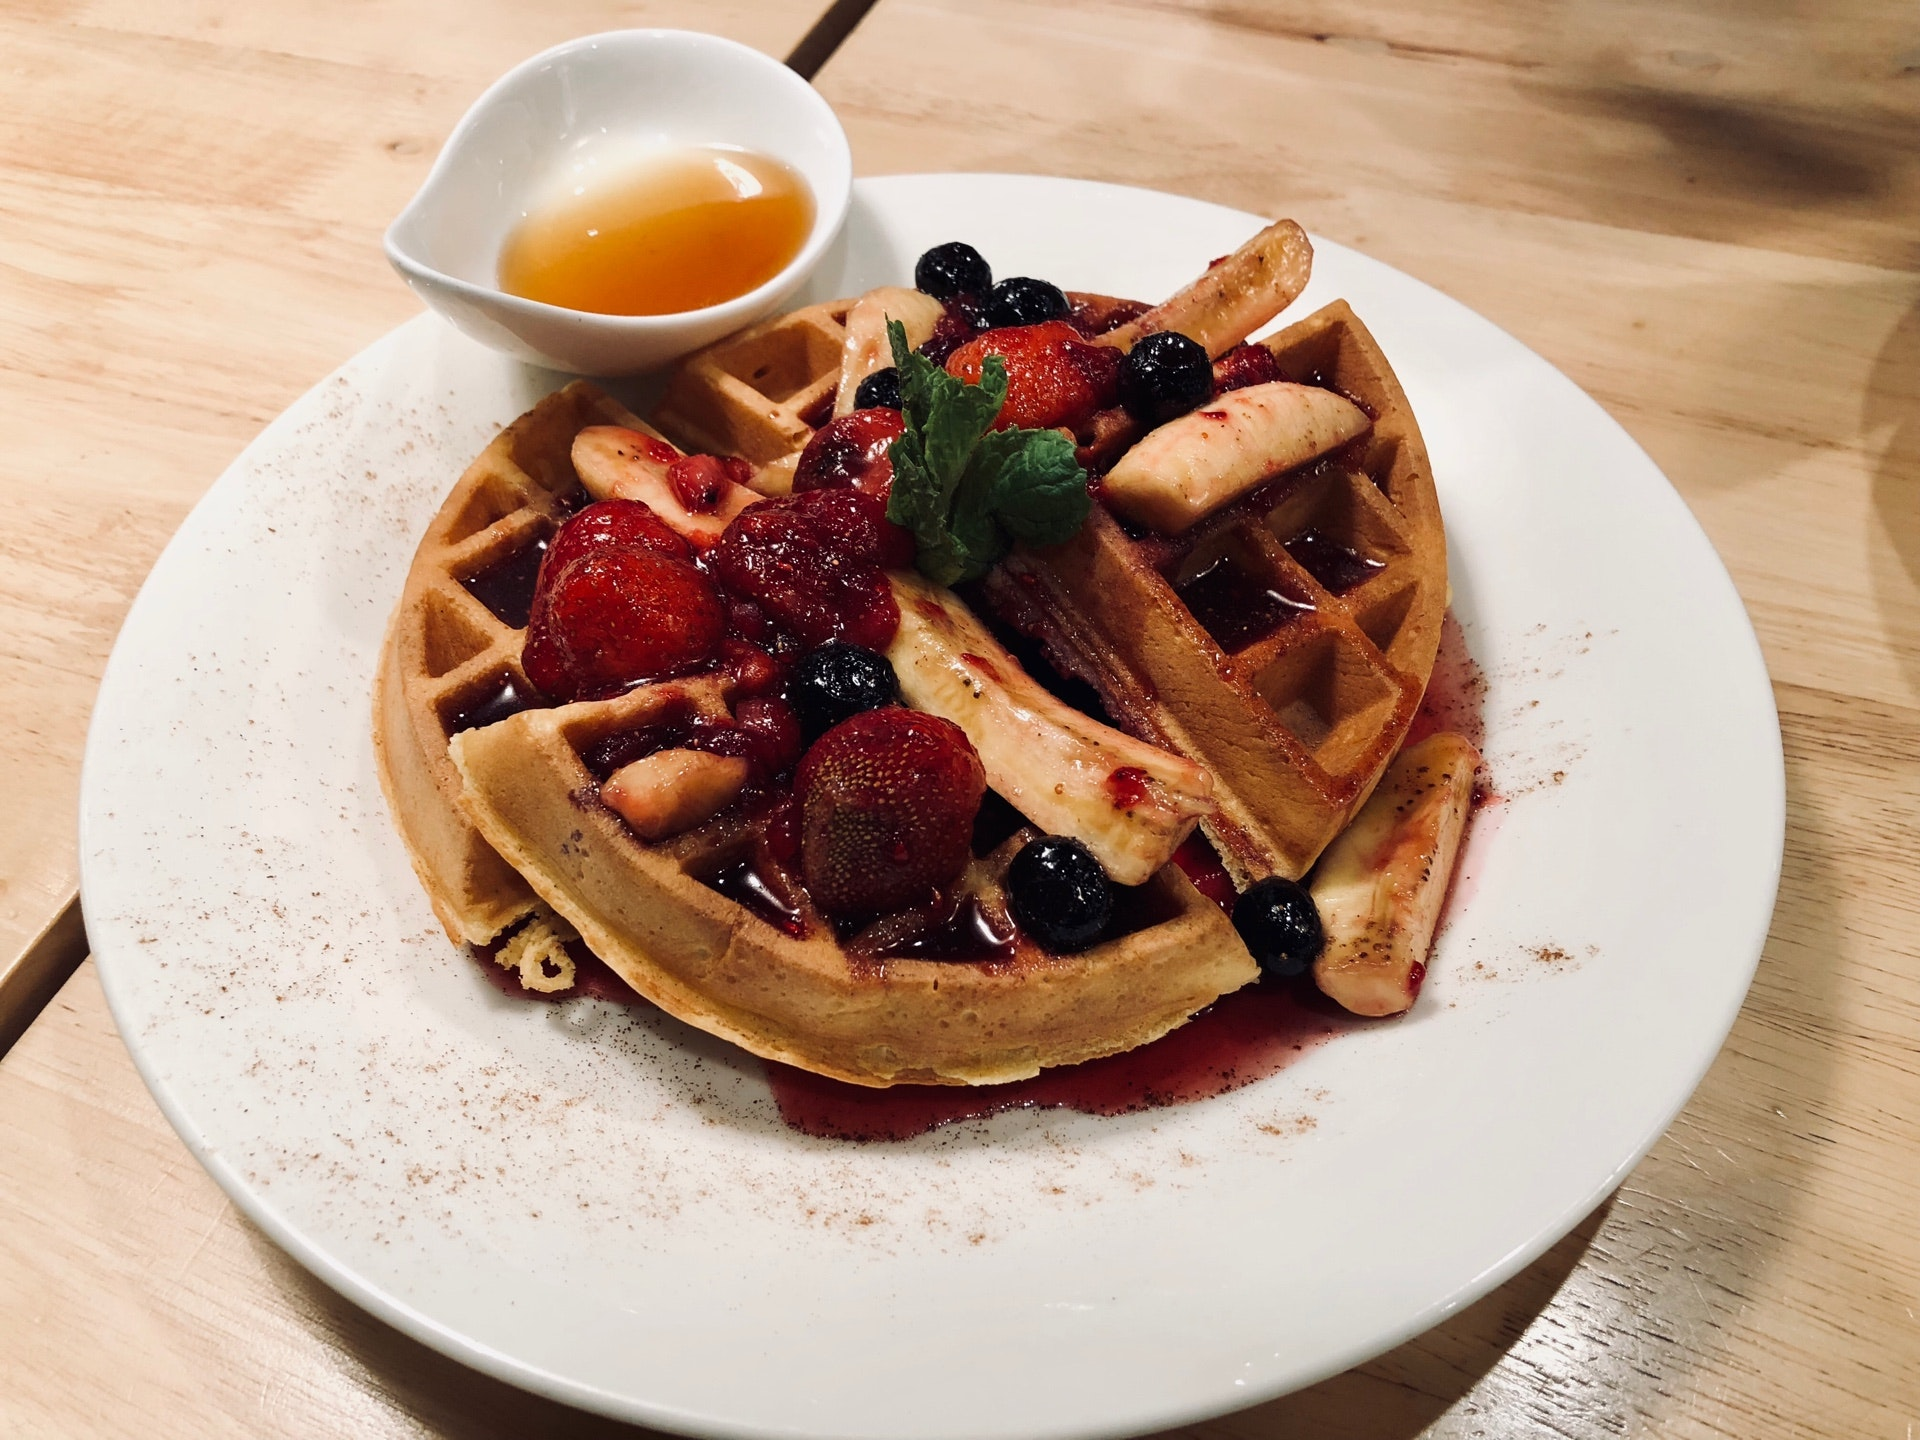 Wantan Works Pancakes 2